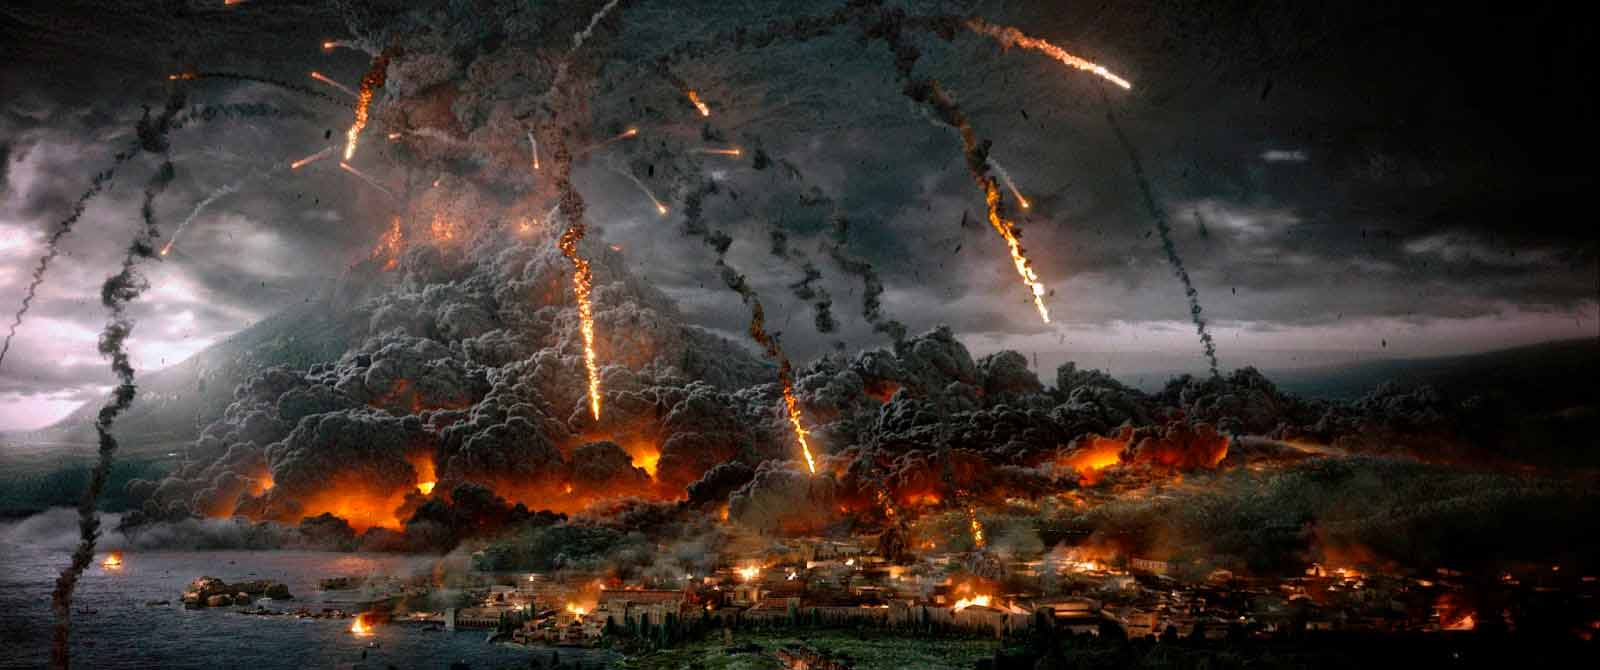 La catastrófica suerte de Pompeya